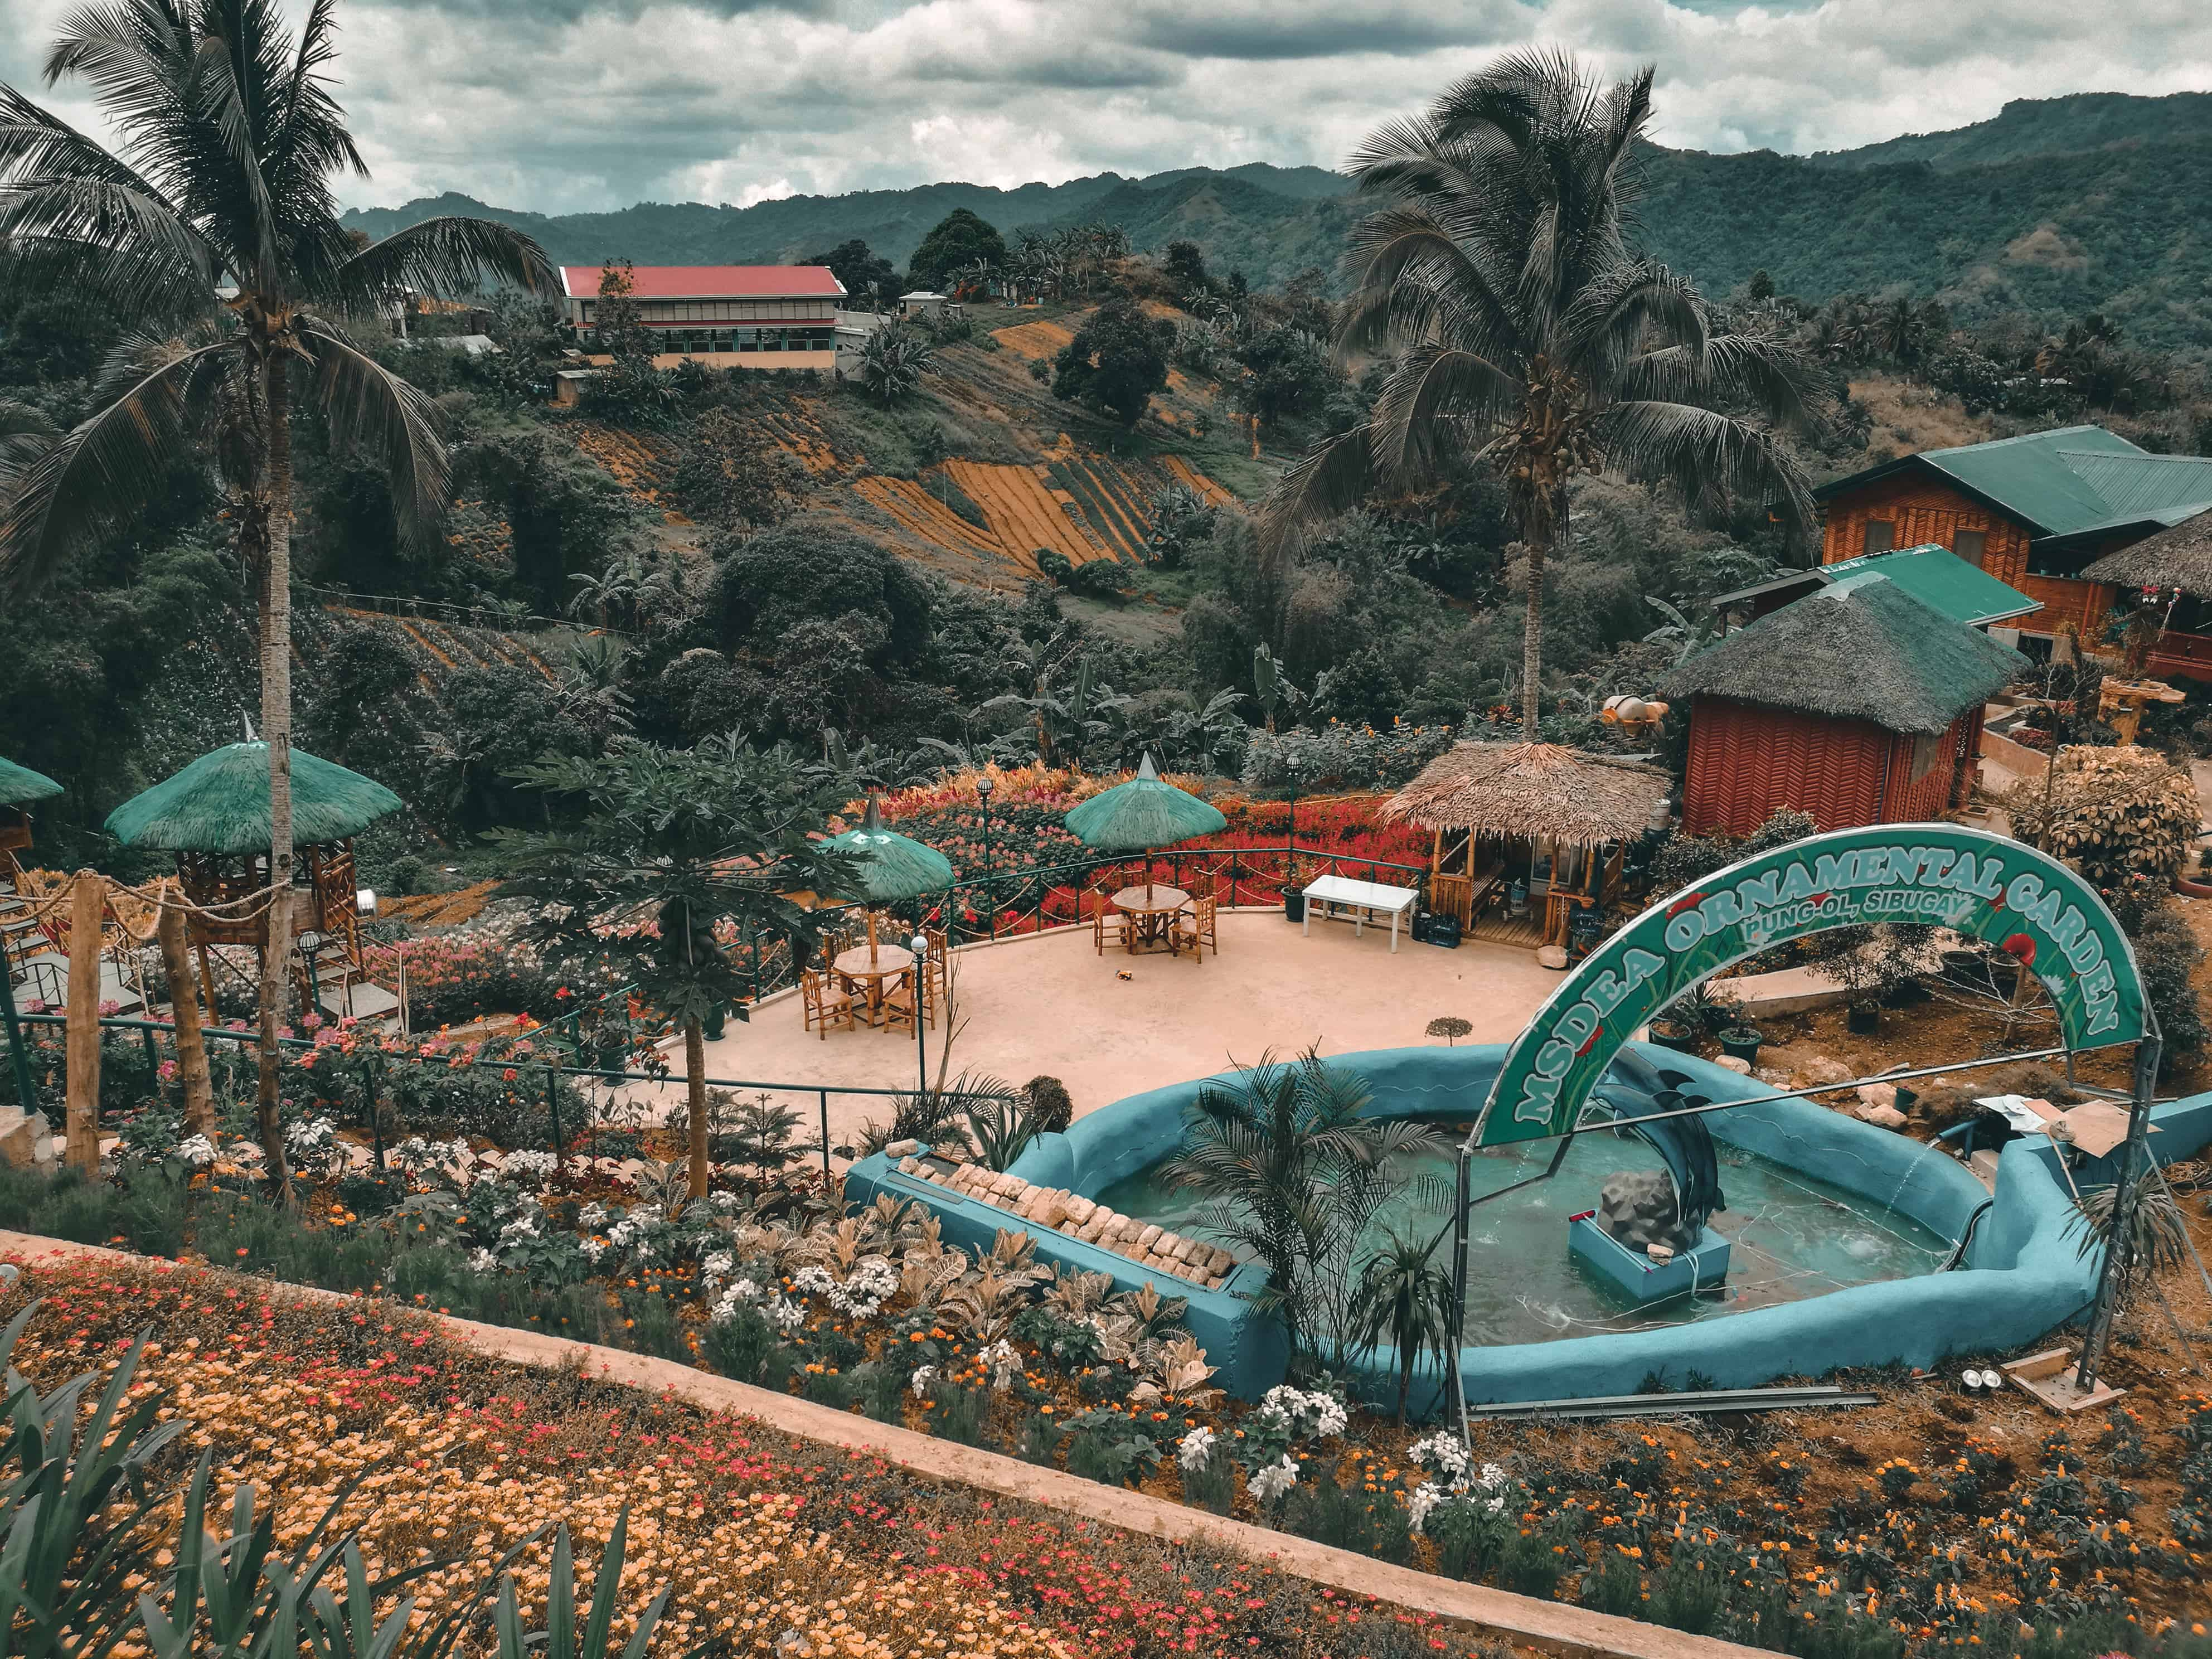 MSDEA Ornamental Garden Cebu City (10)